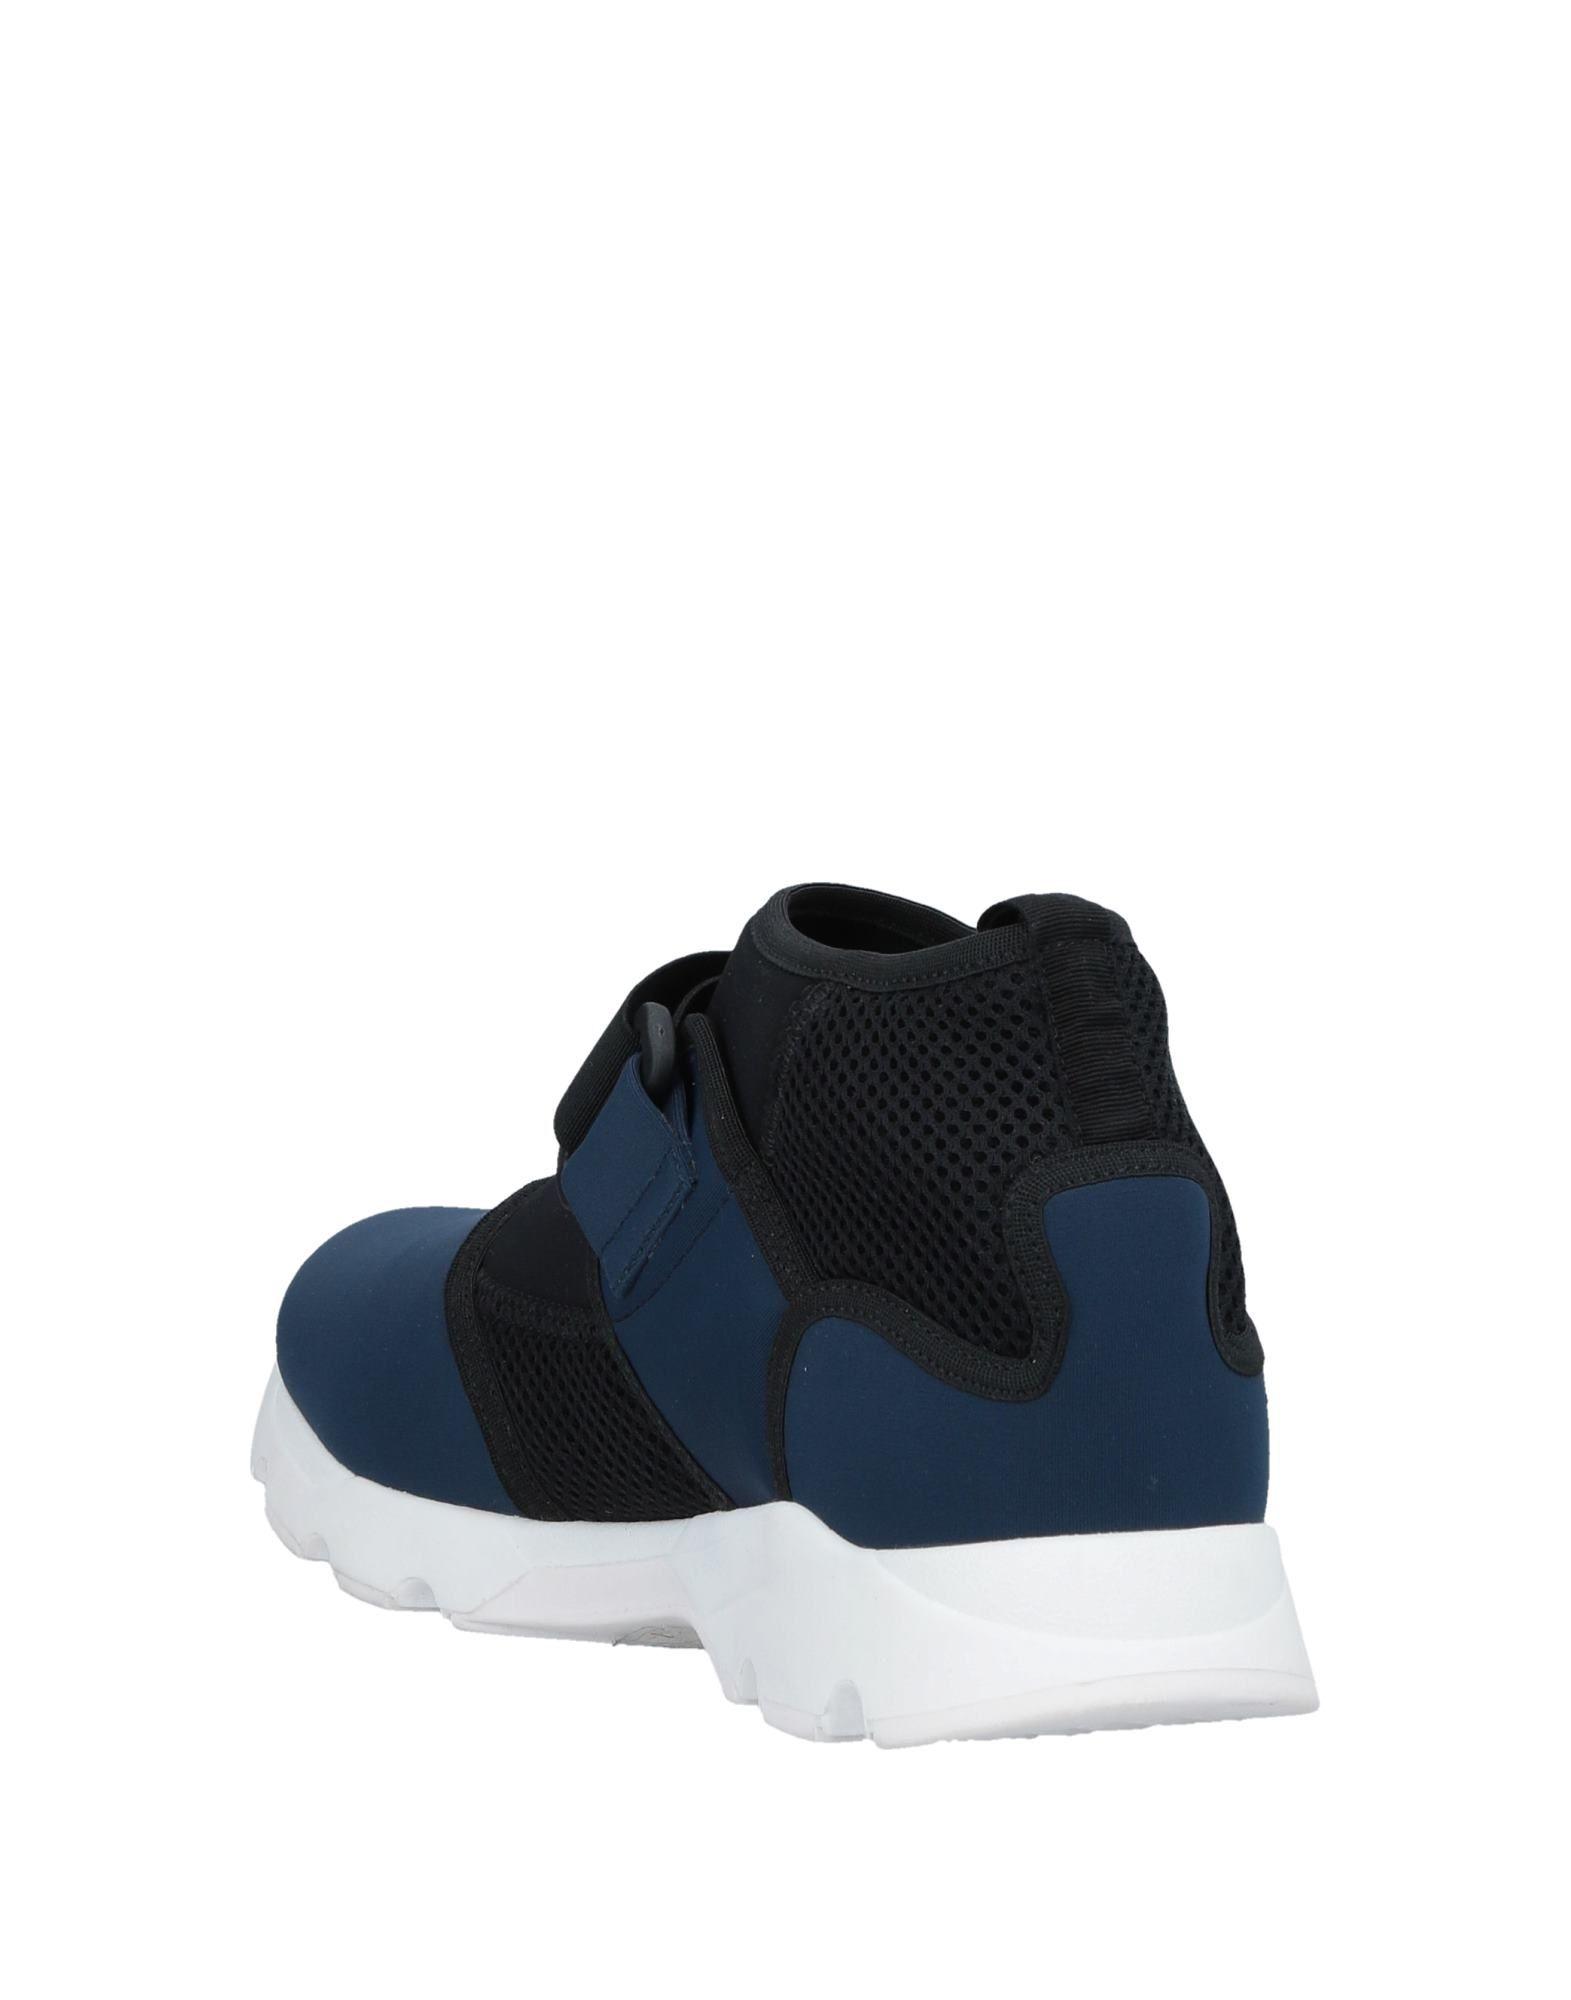 Marni Sneakers Herren  11528810HT Gute Qualität beliebte Schuhe